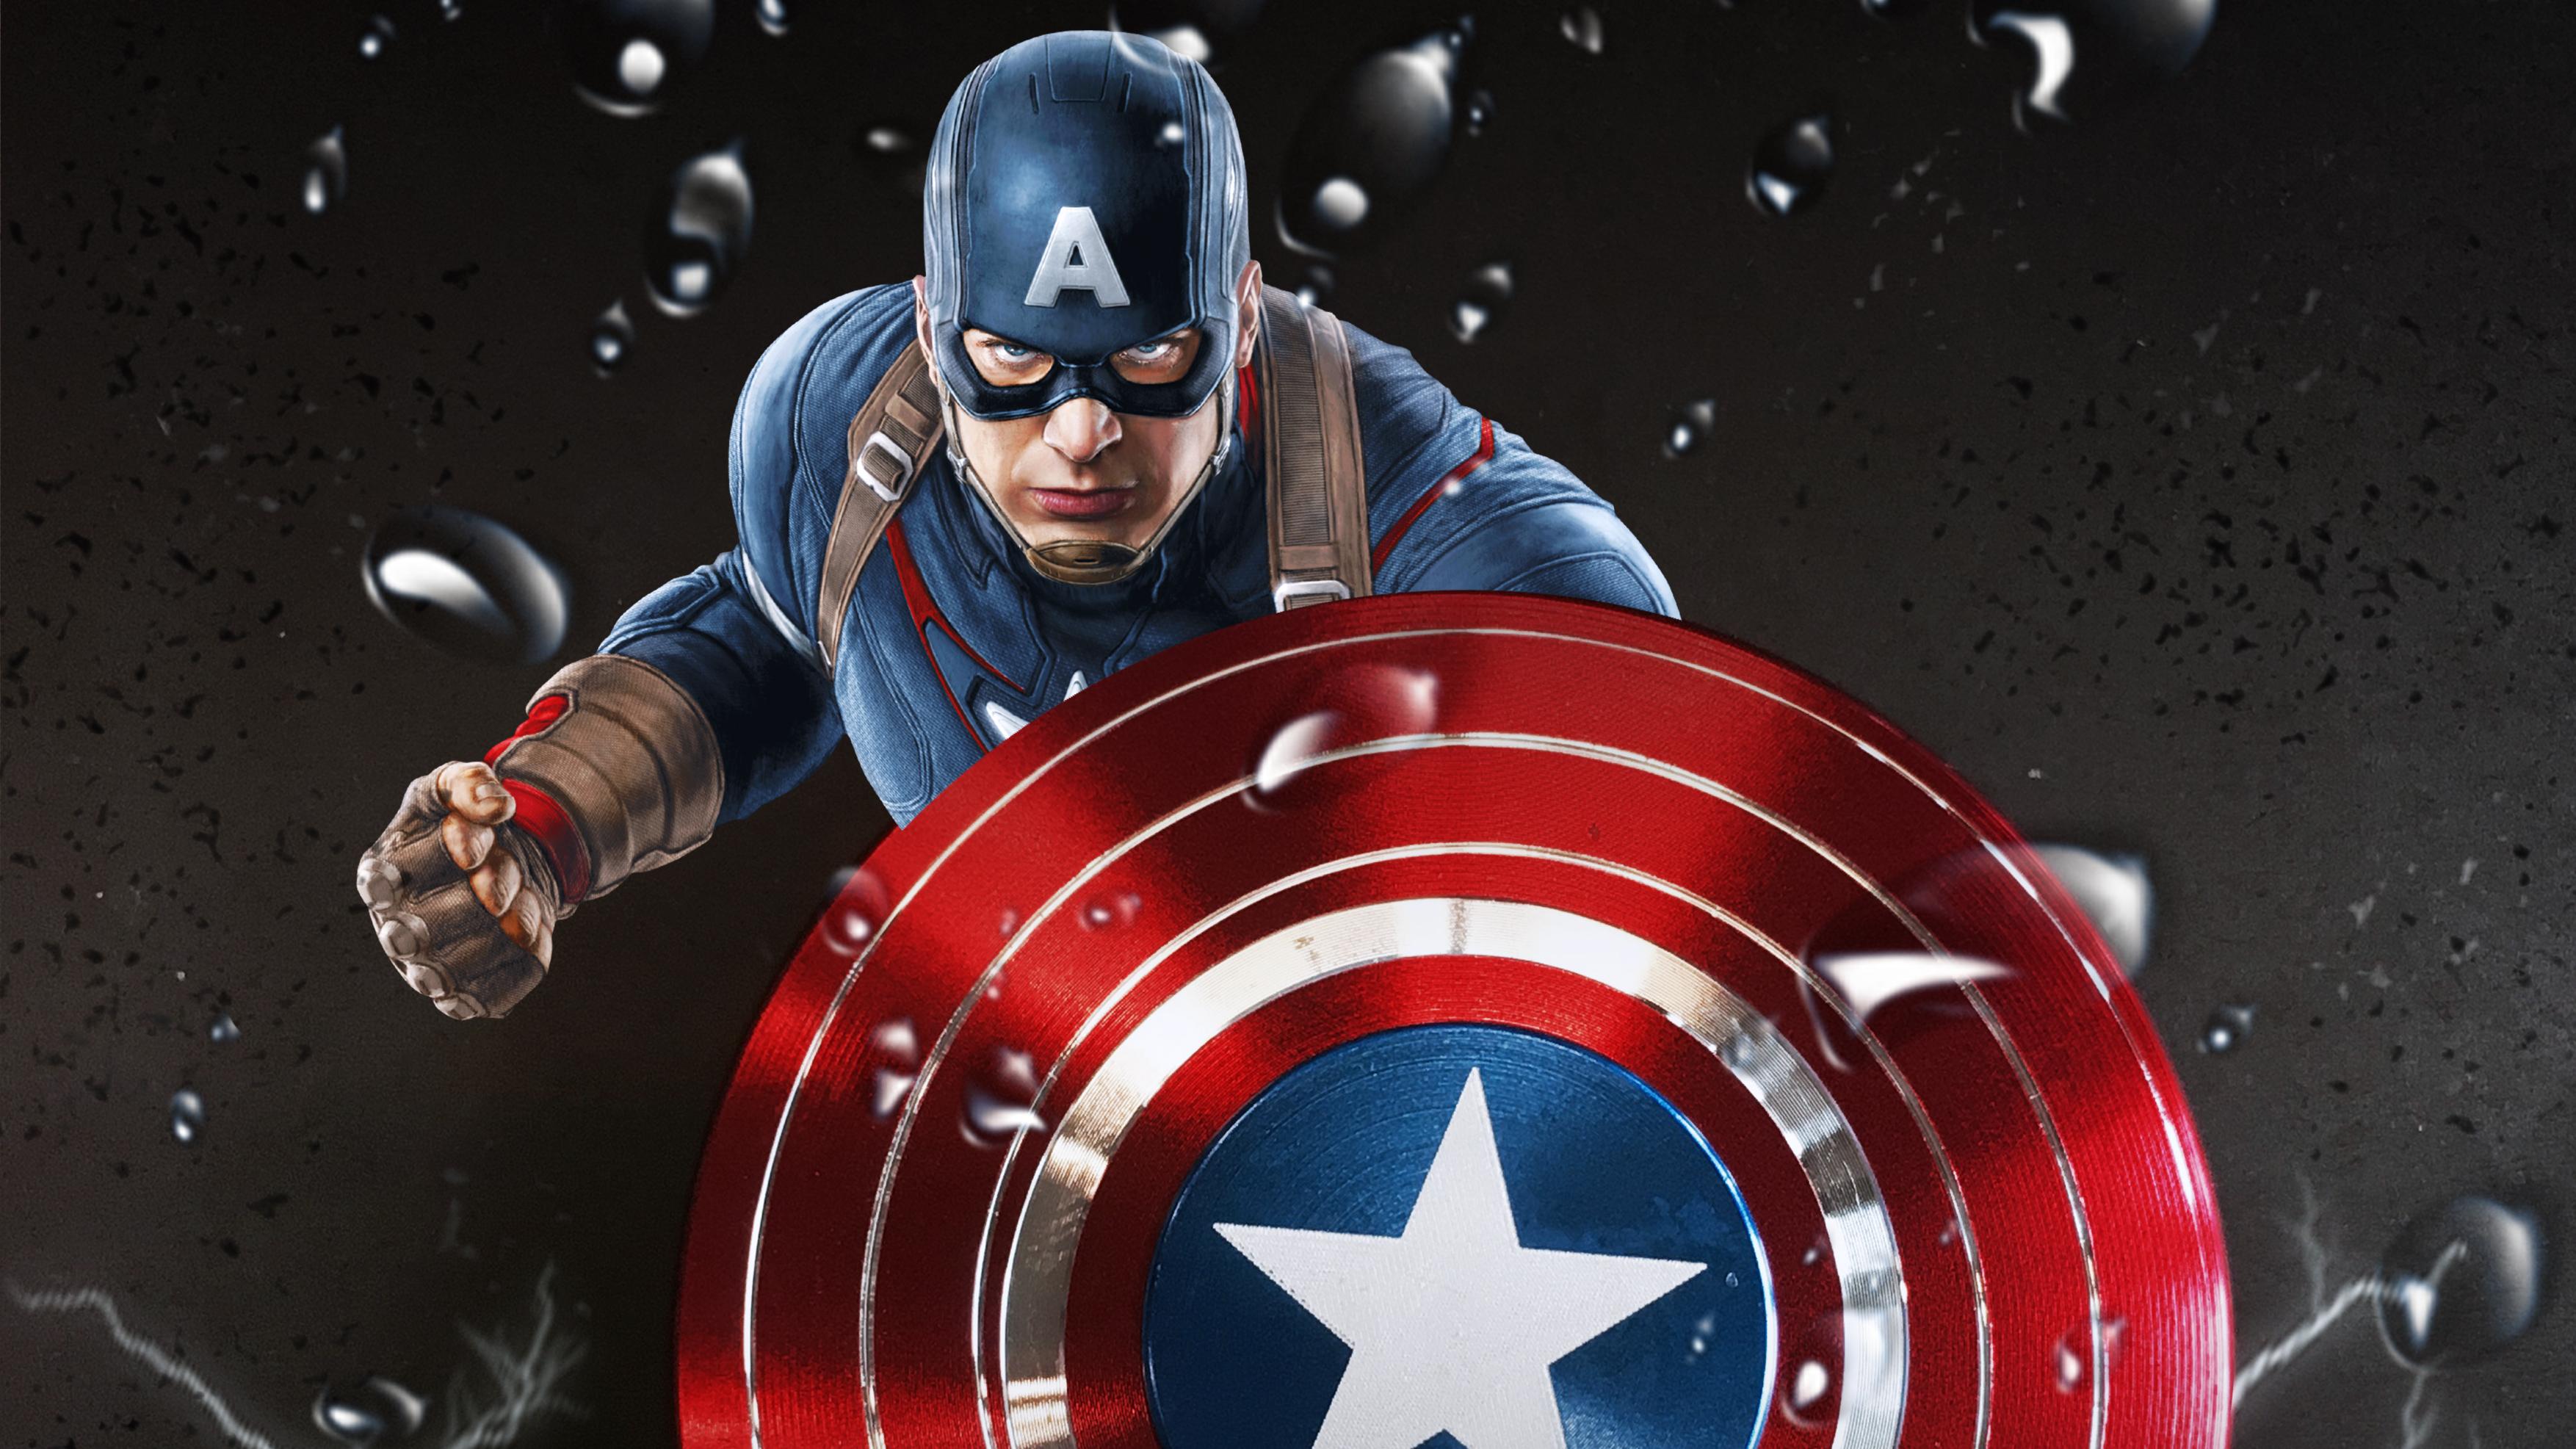 Captain America Hd Wallpaper Background Image 3508x1973